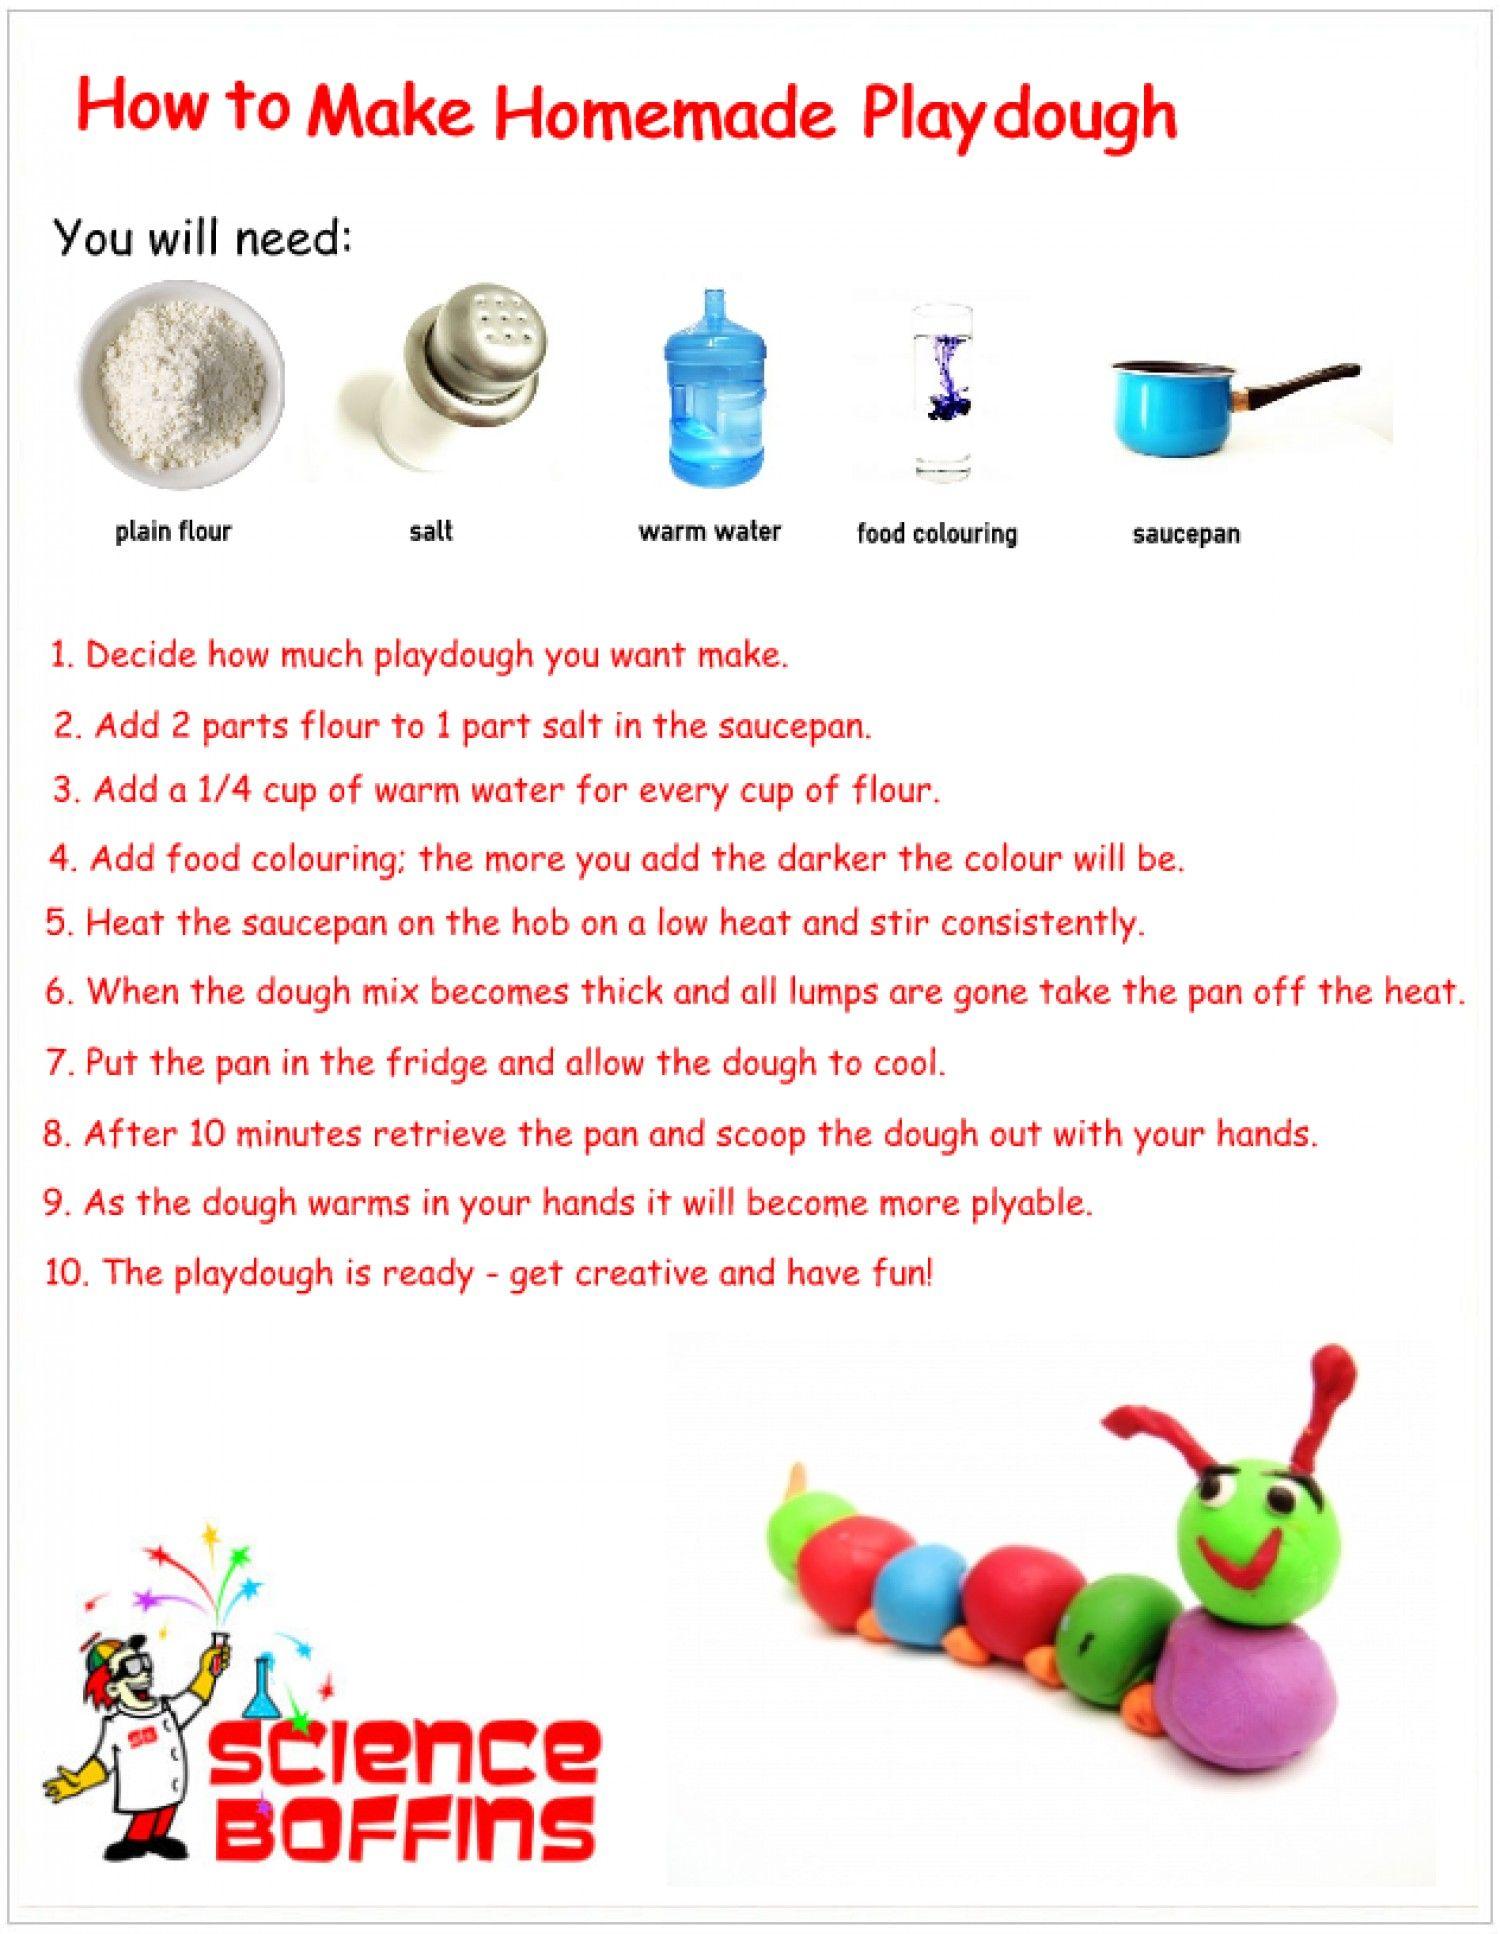 How To Make Playdough Visual Ly Homemade Playdough Craft Activities For Kids Playdough